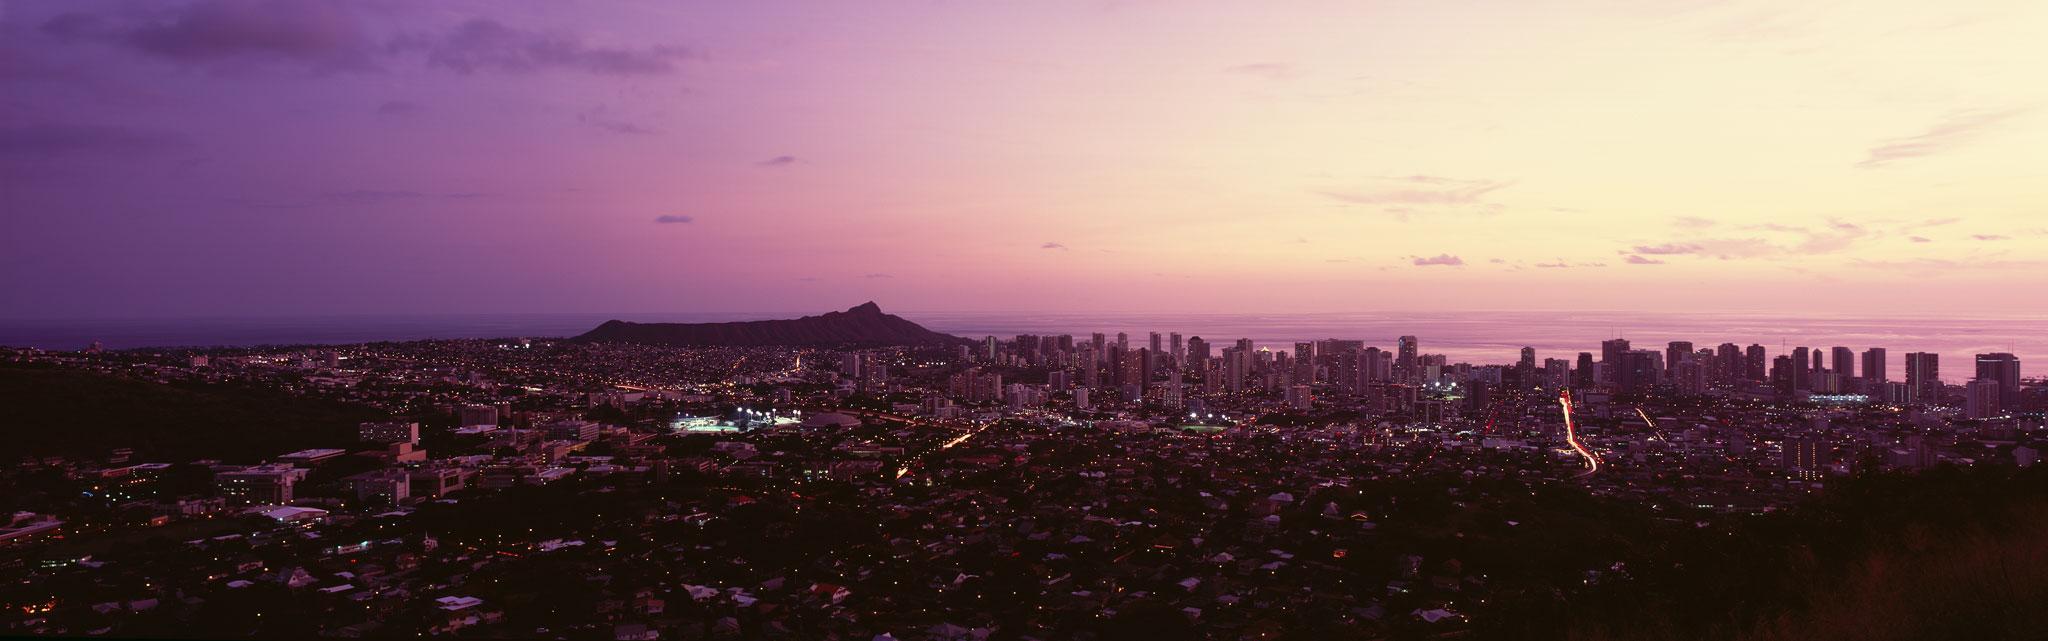 Honolulu from Tantalus : Oahu